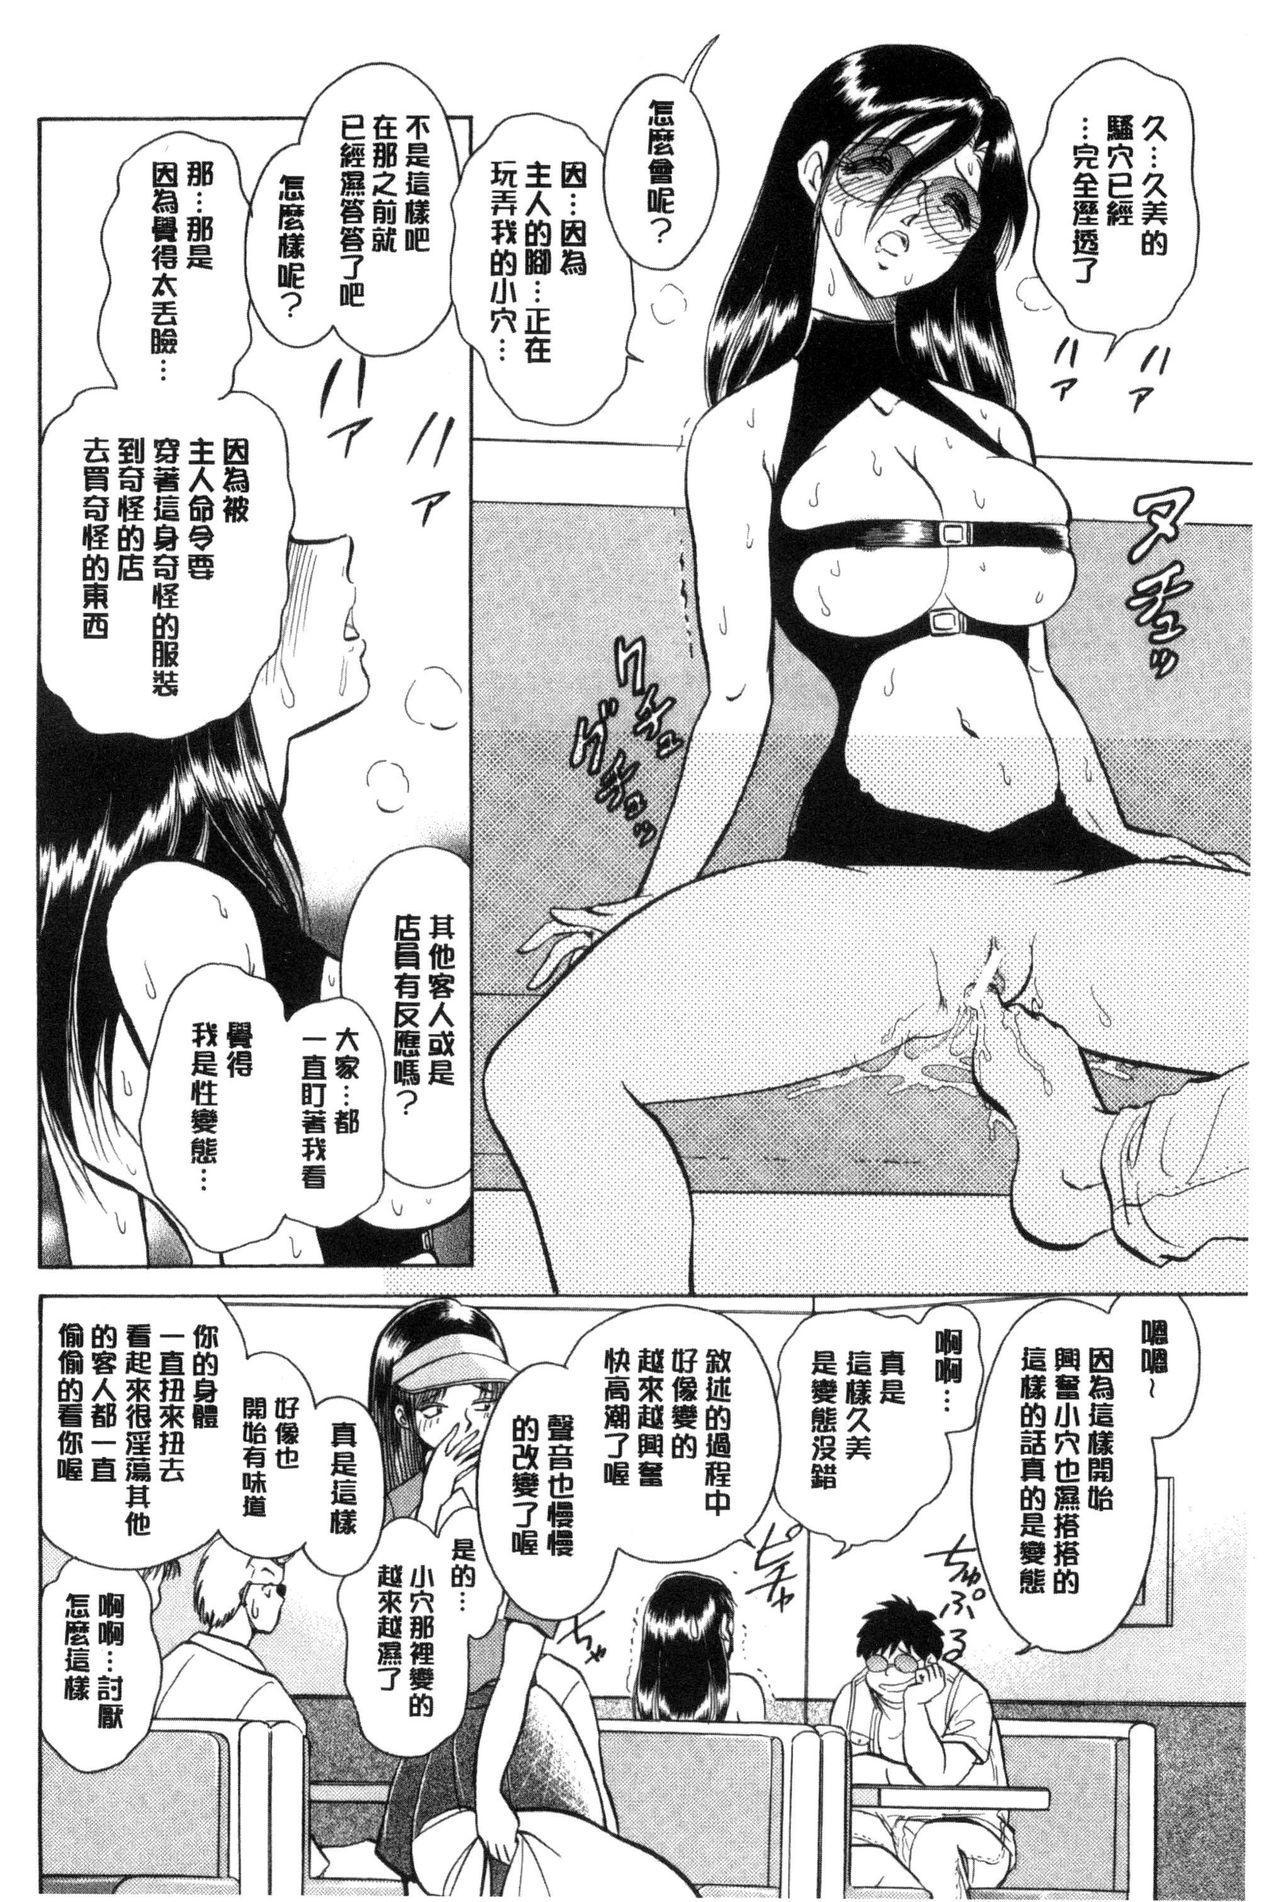 Hazukashii Kagai Jugyou | 害羞的課外授業 56